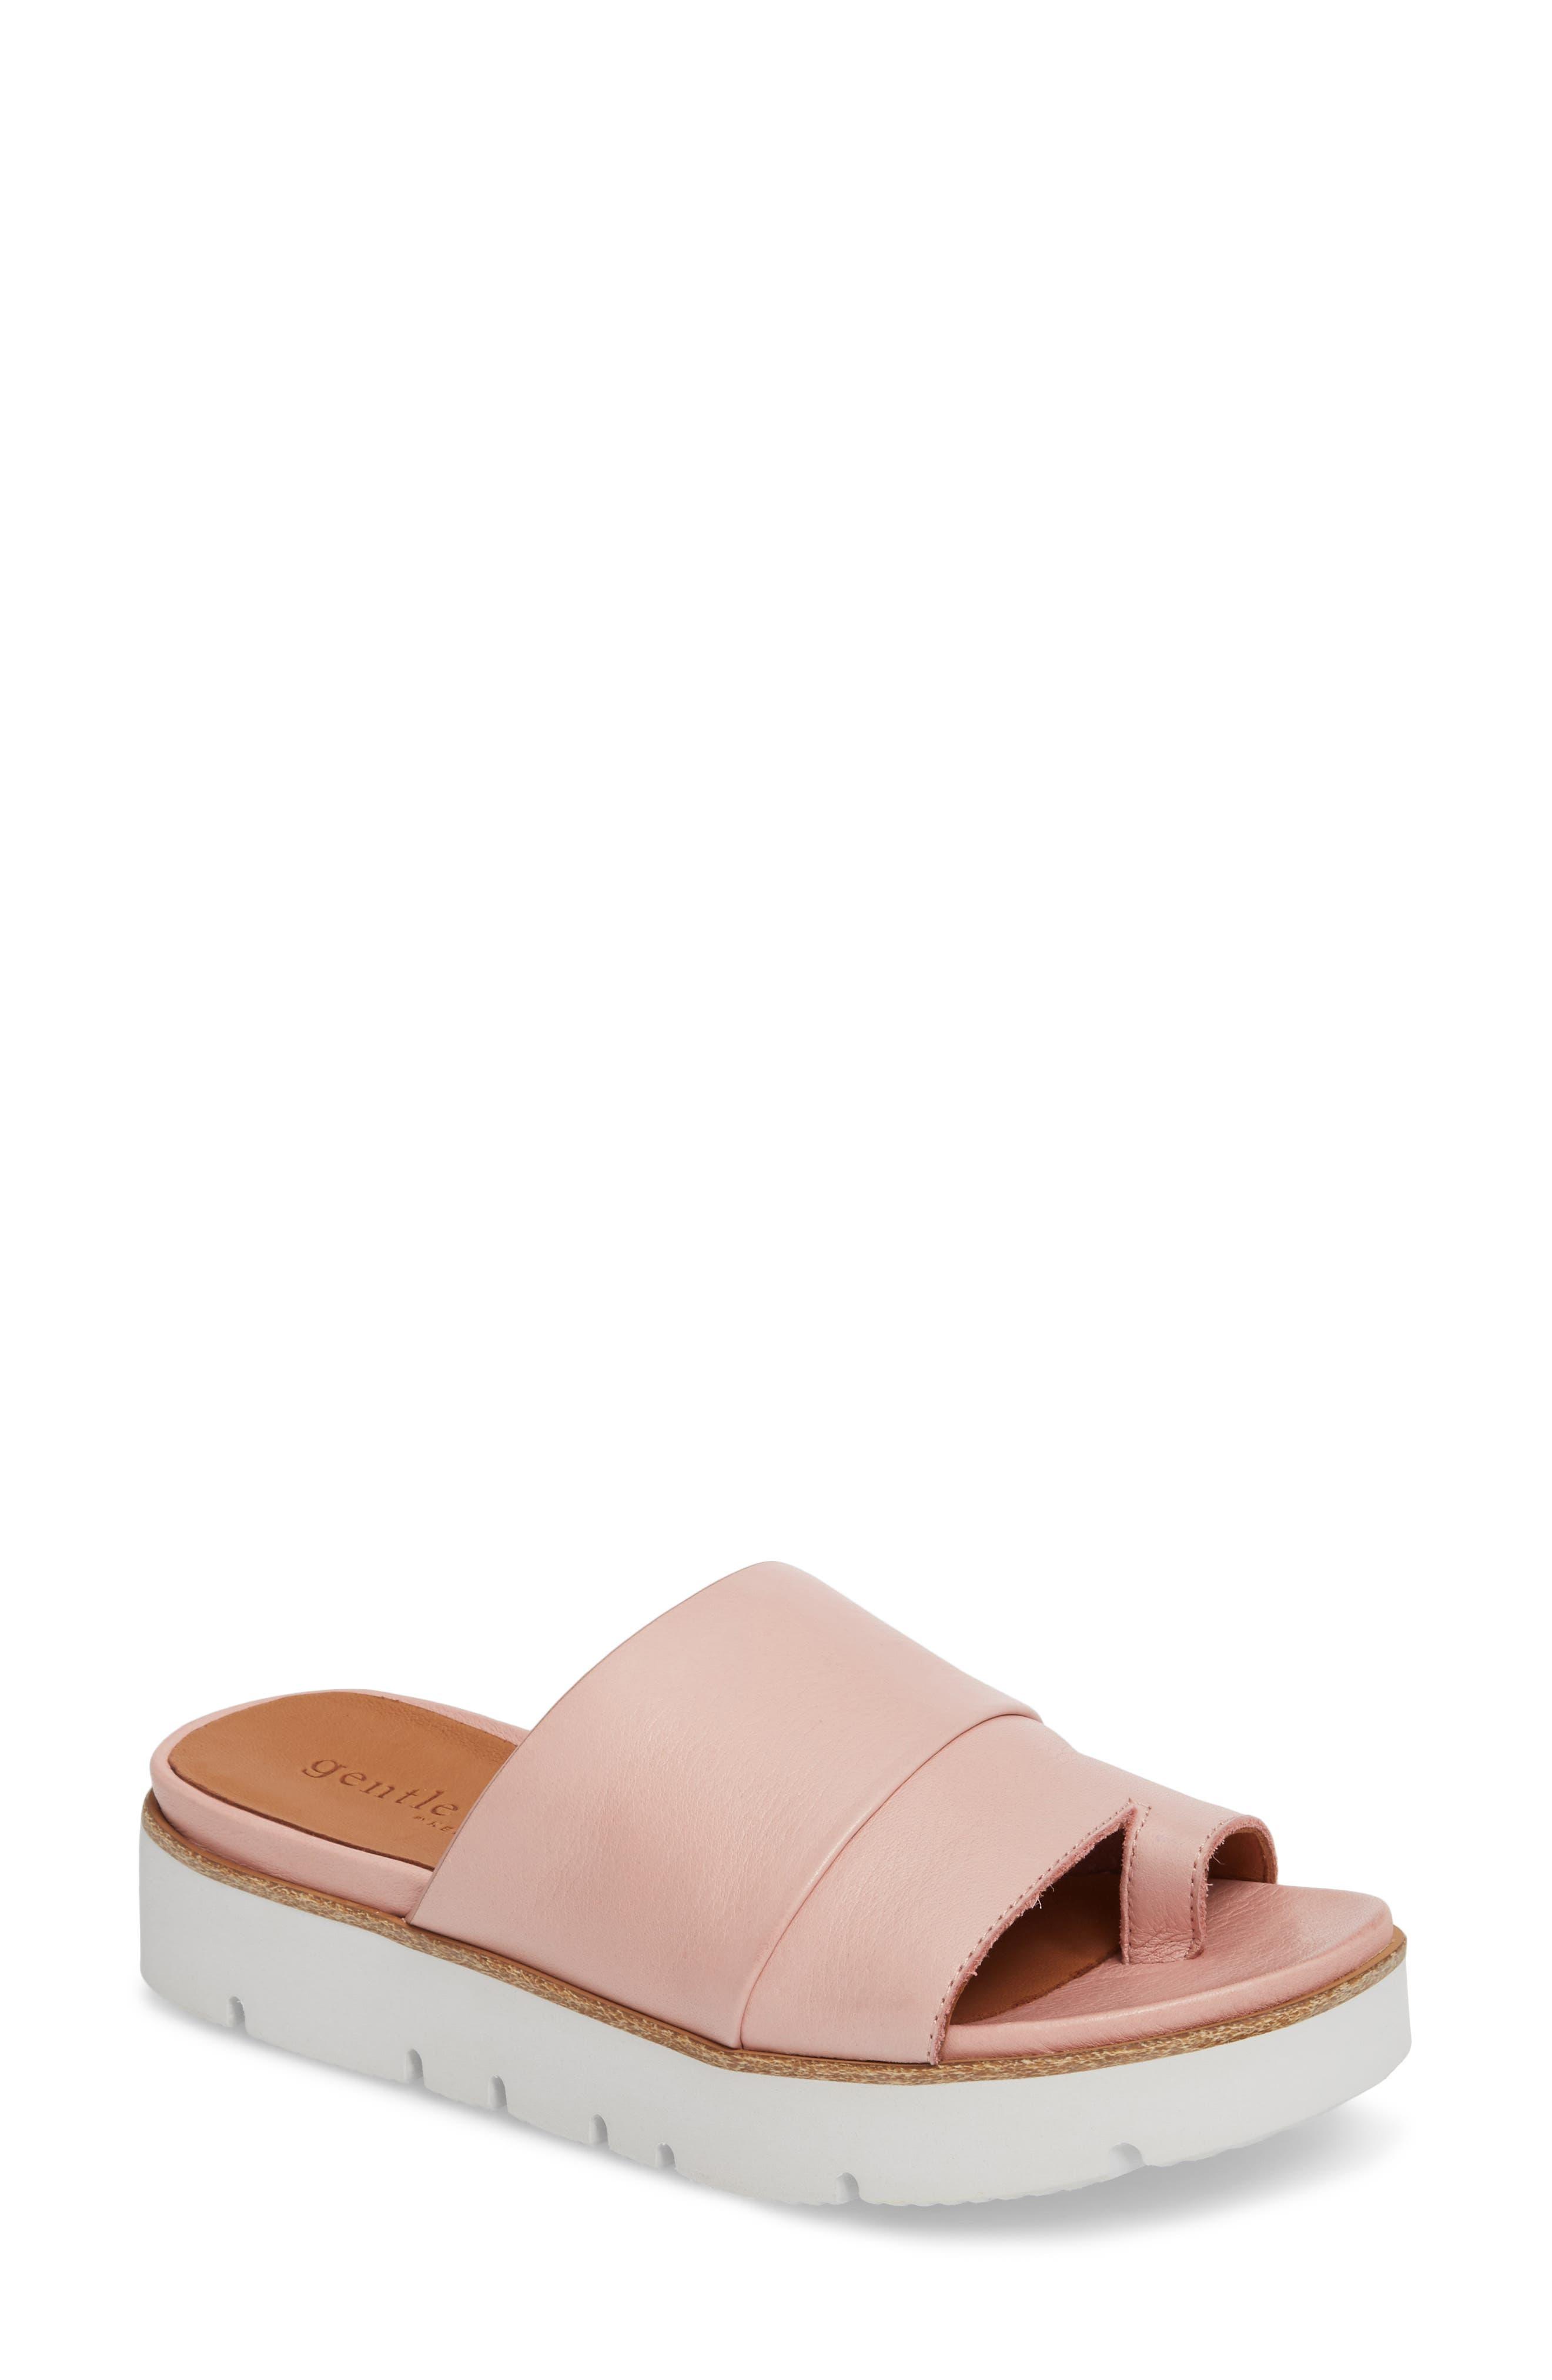 Newest Online With Credit Card For Sale Kenneth Cole Gentle Souls Women's Lavern Leather Platform Slide Sandals FkvYikaWC